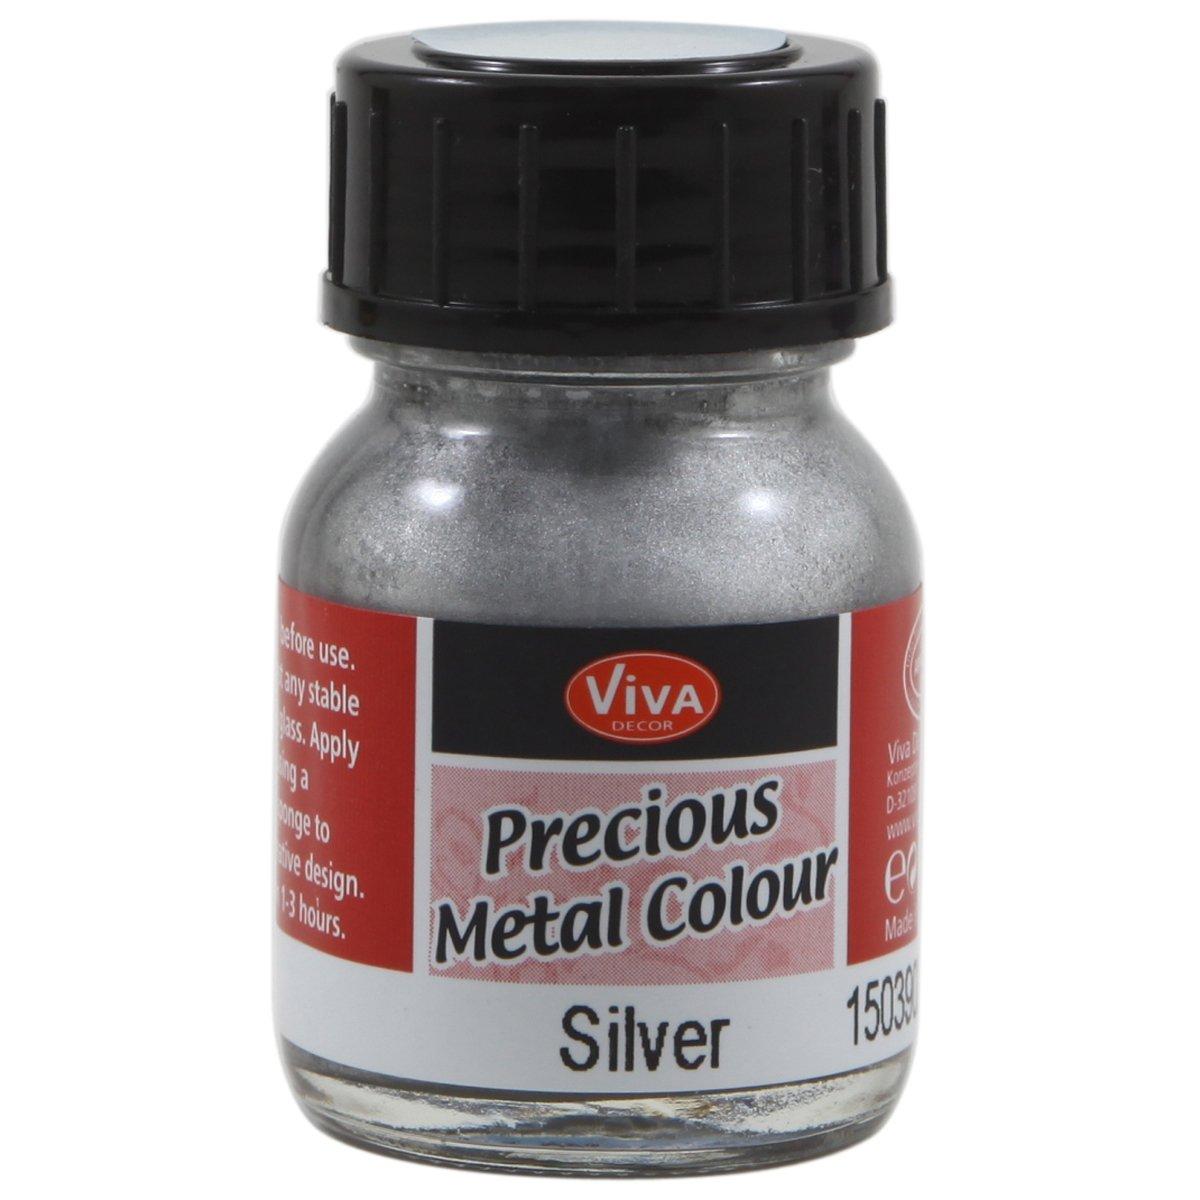 Viva Decor Precious Metal Color 25ml-Silver by Viva Decor